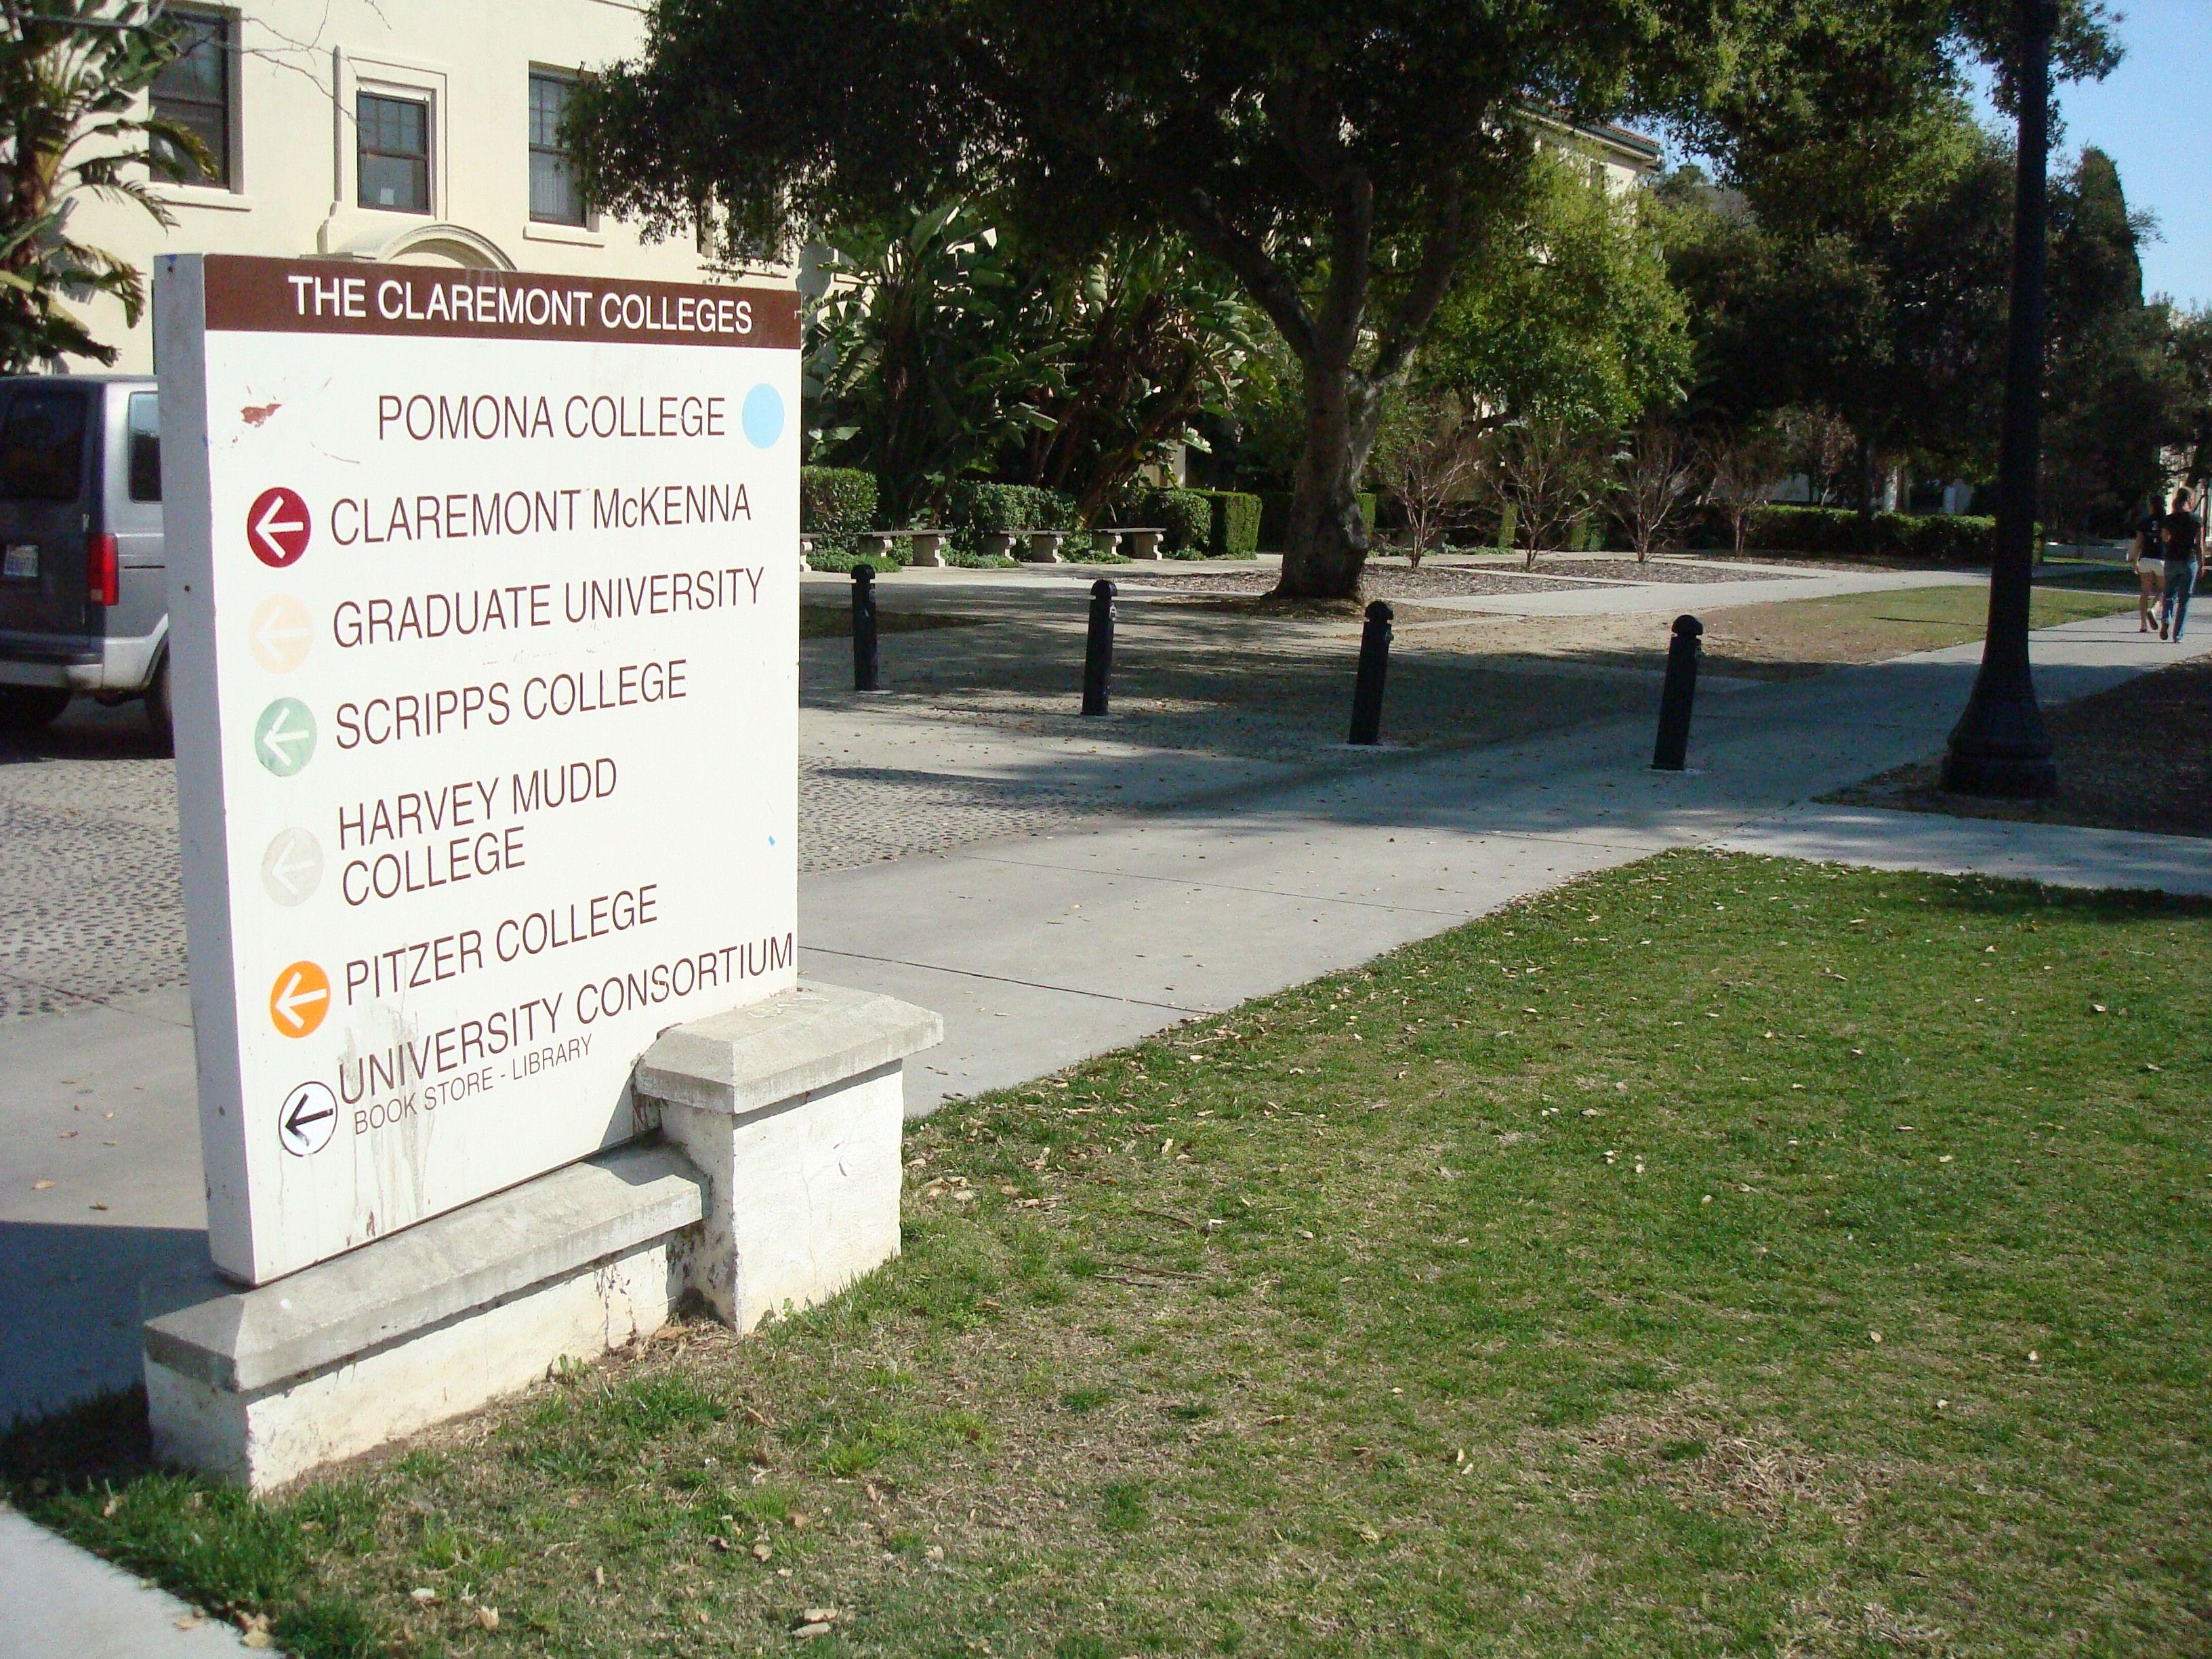 Claremont Colleges (Joe Cruz photo).